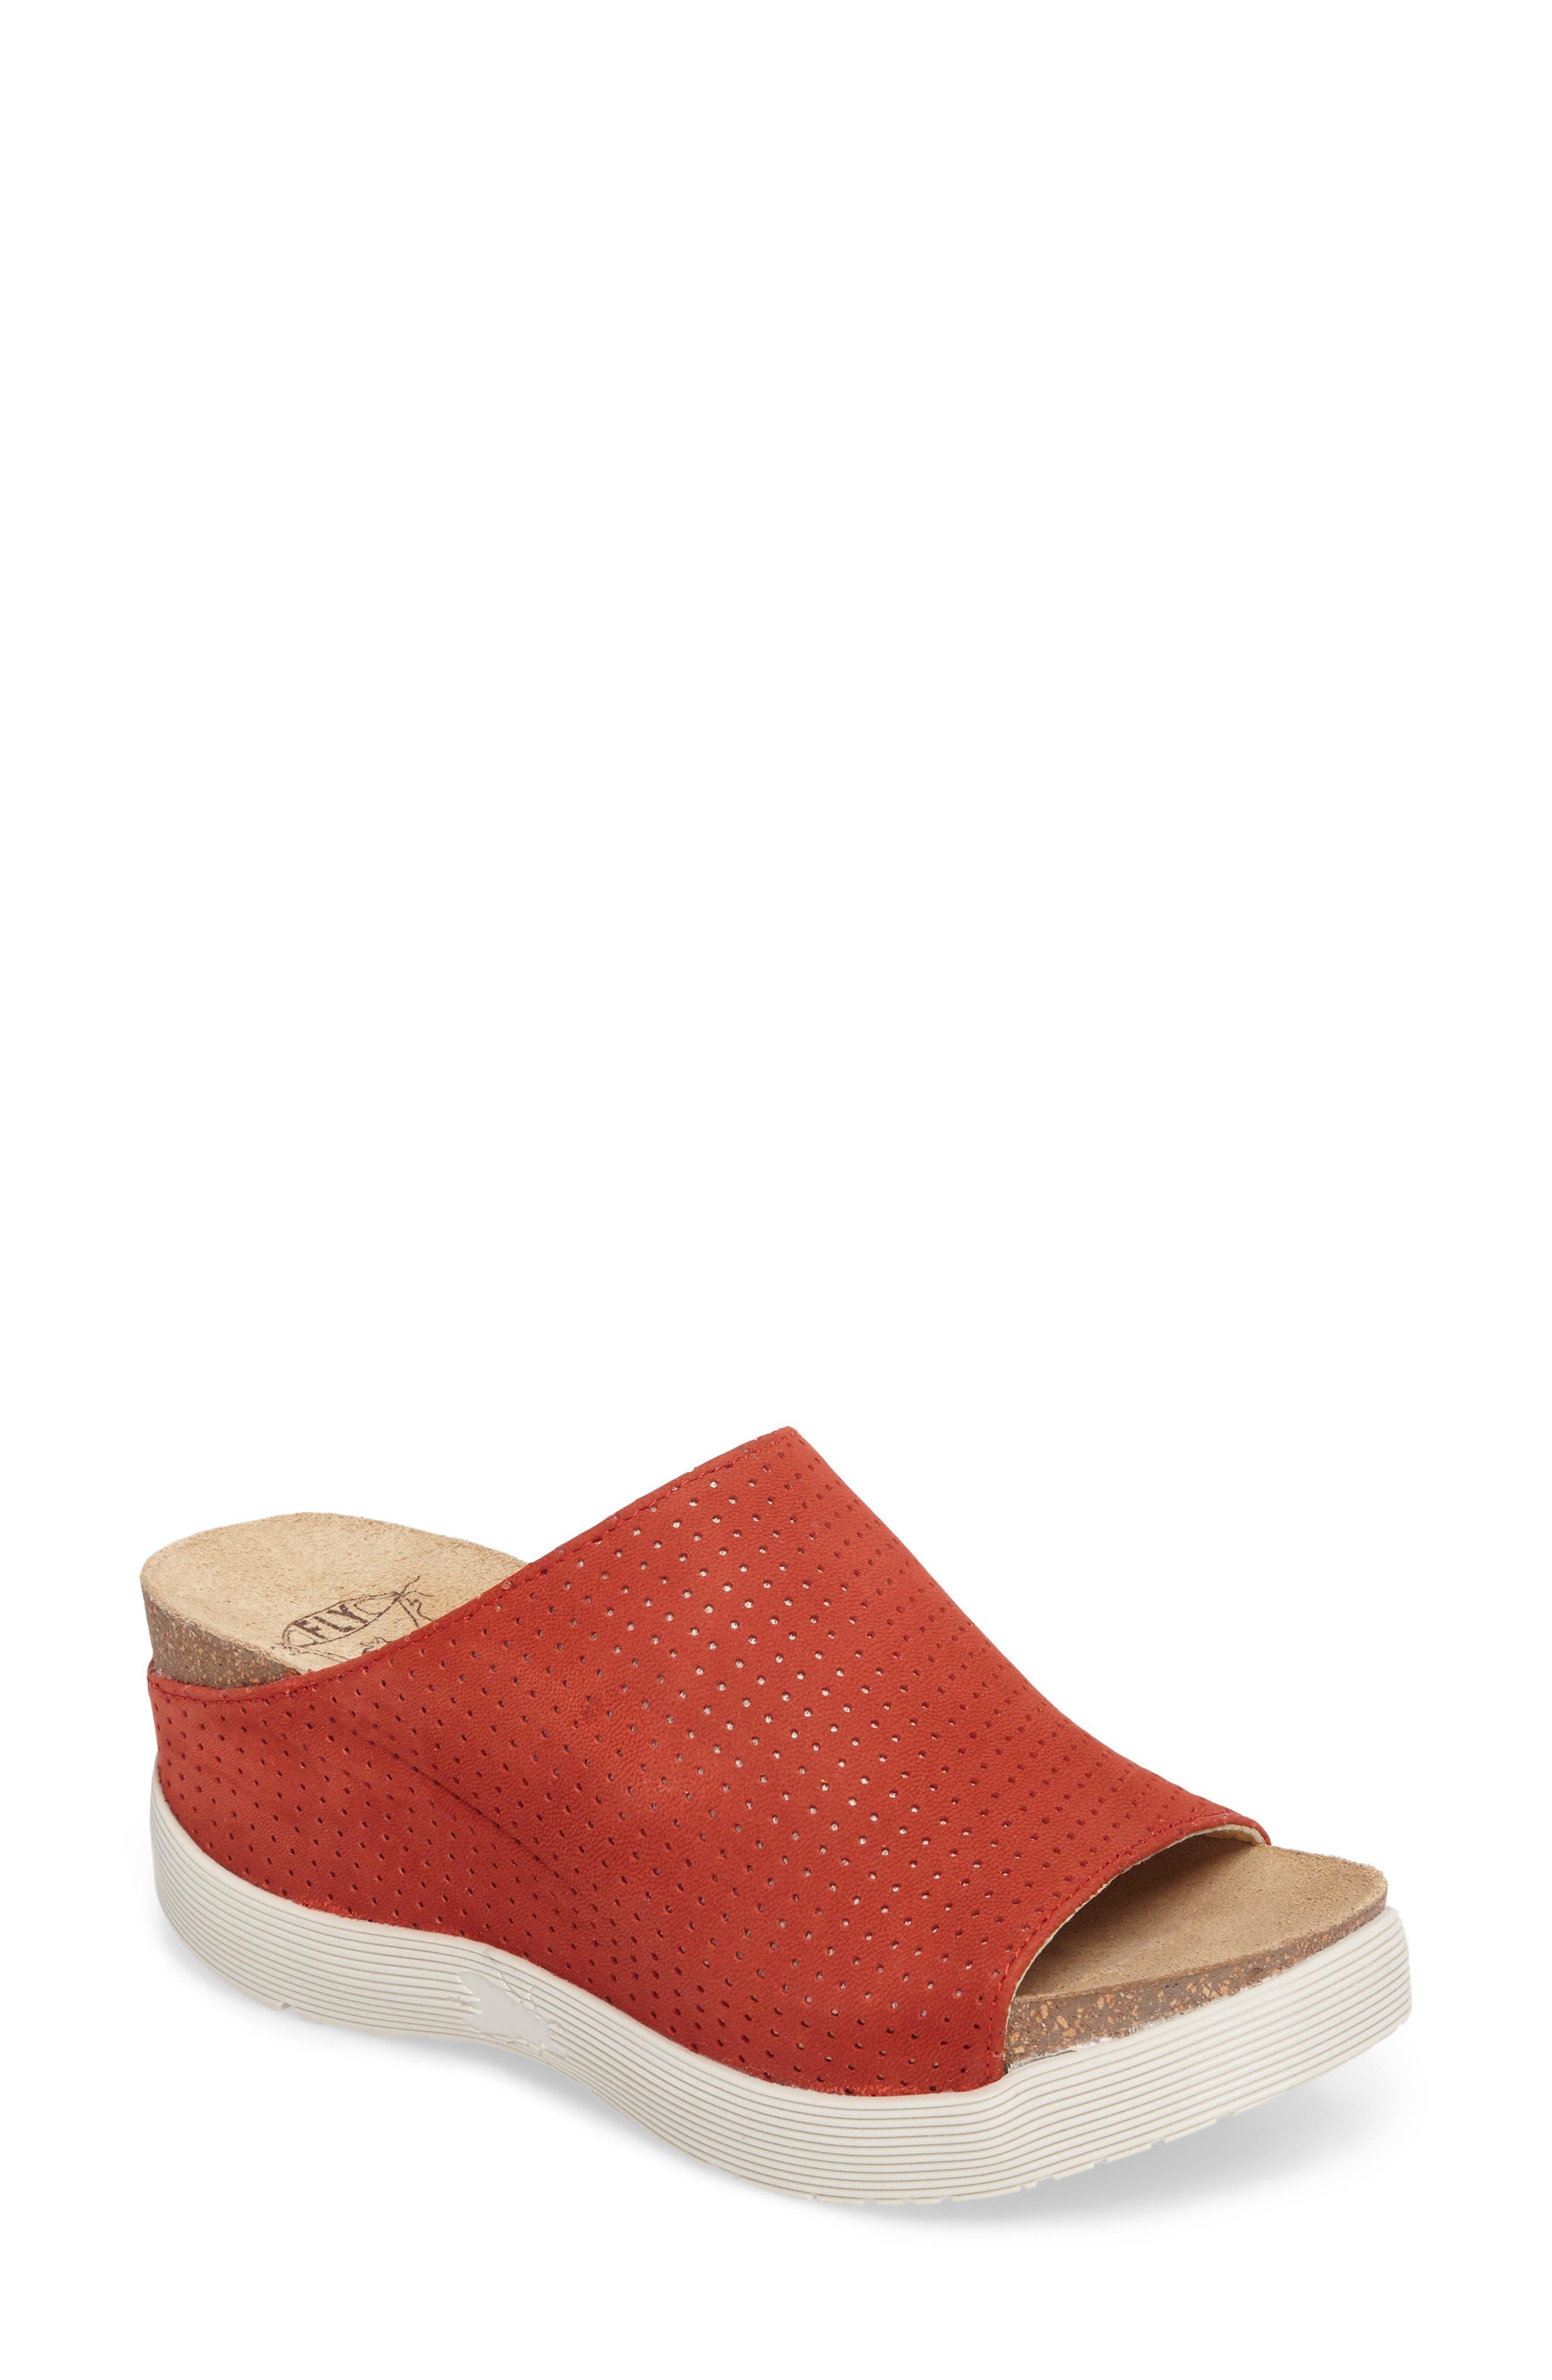 Whin Platform Sandal,                             Main thumbnail 1, color,                             Scarlet Cupido Leather